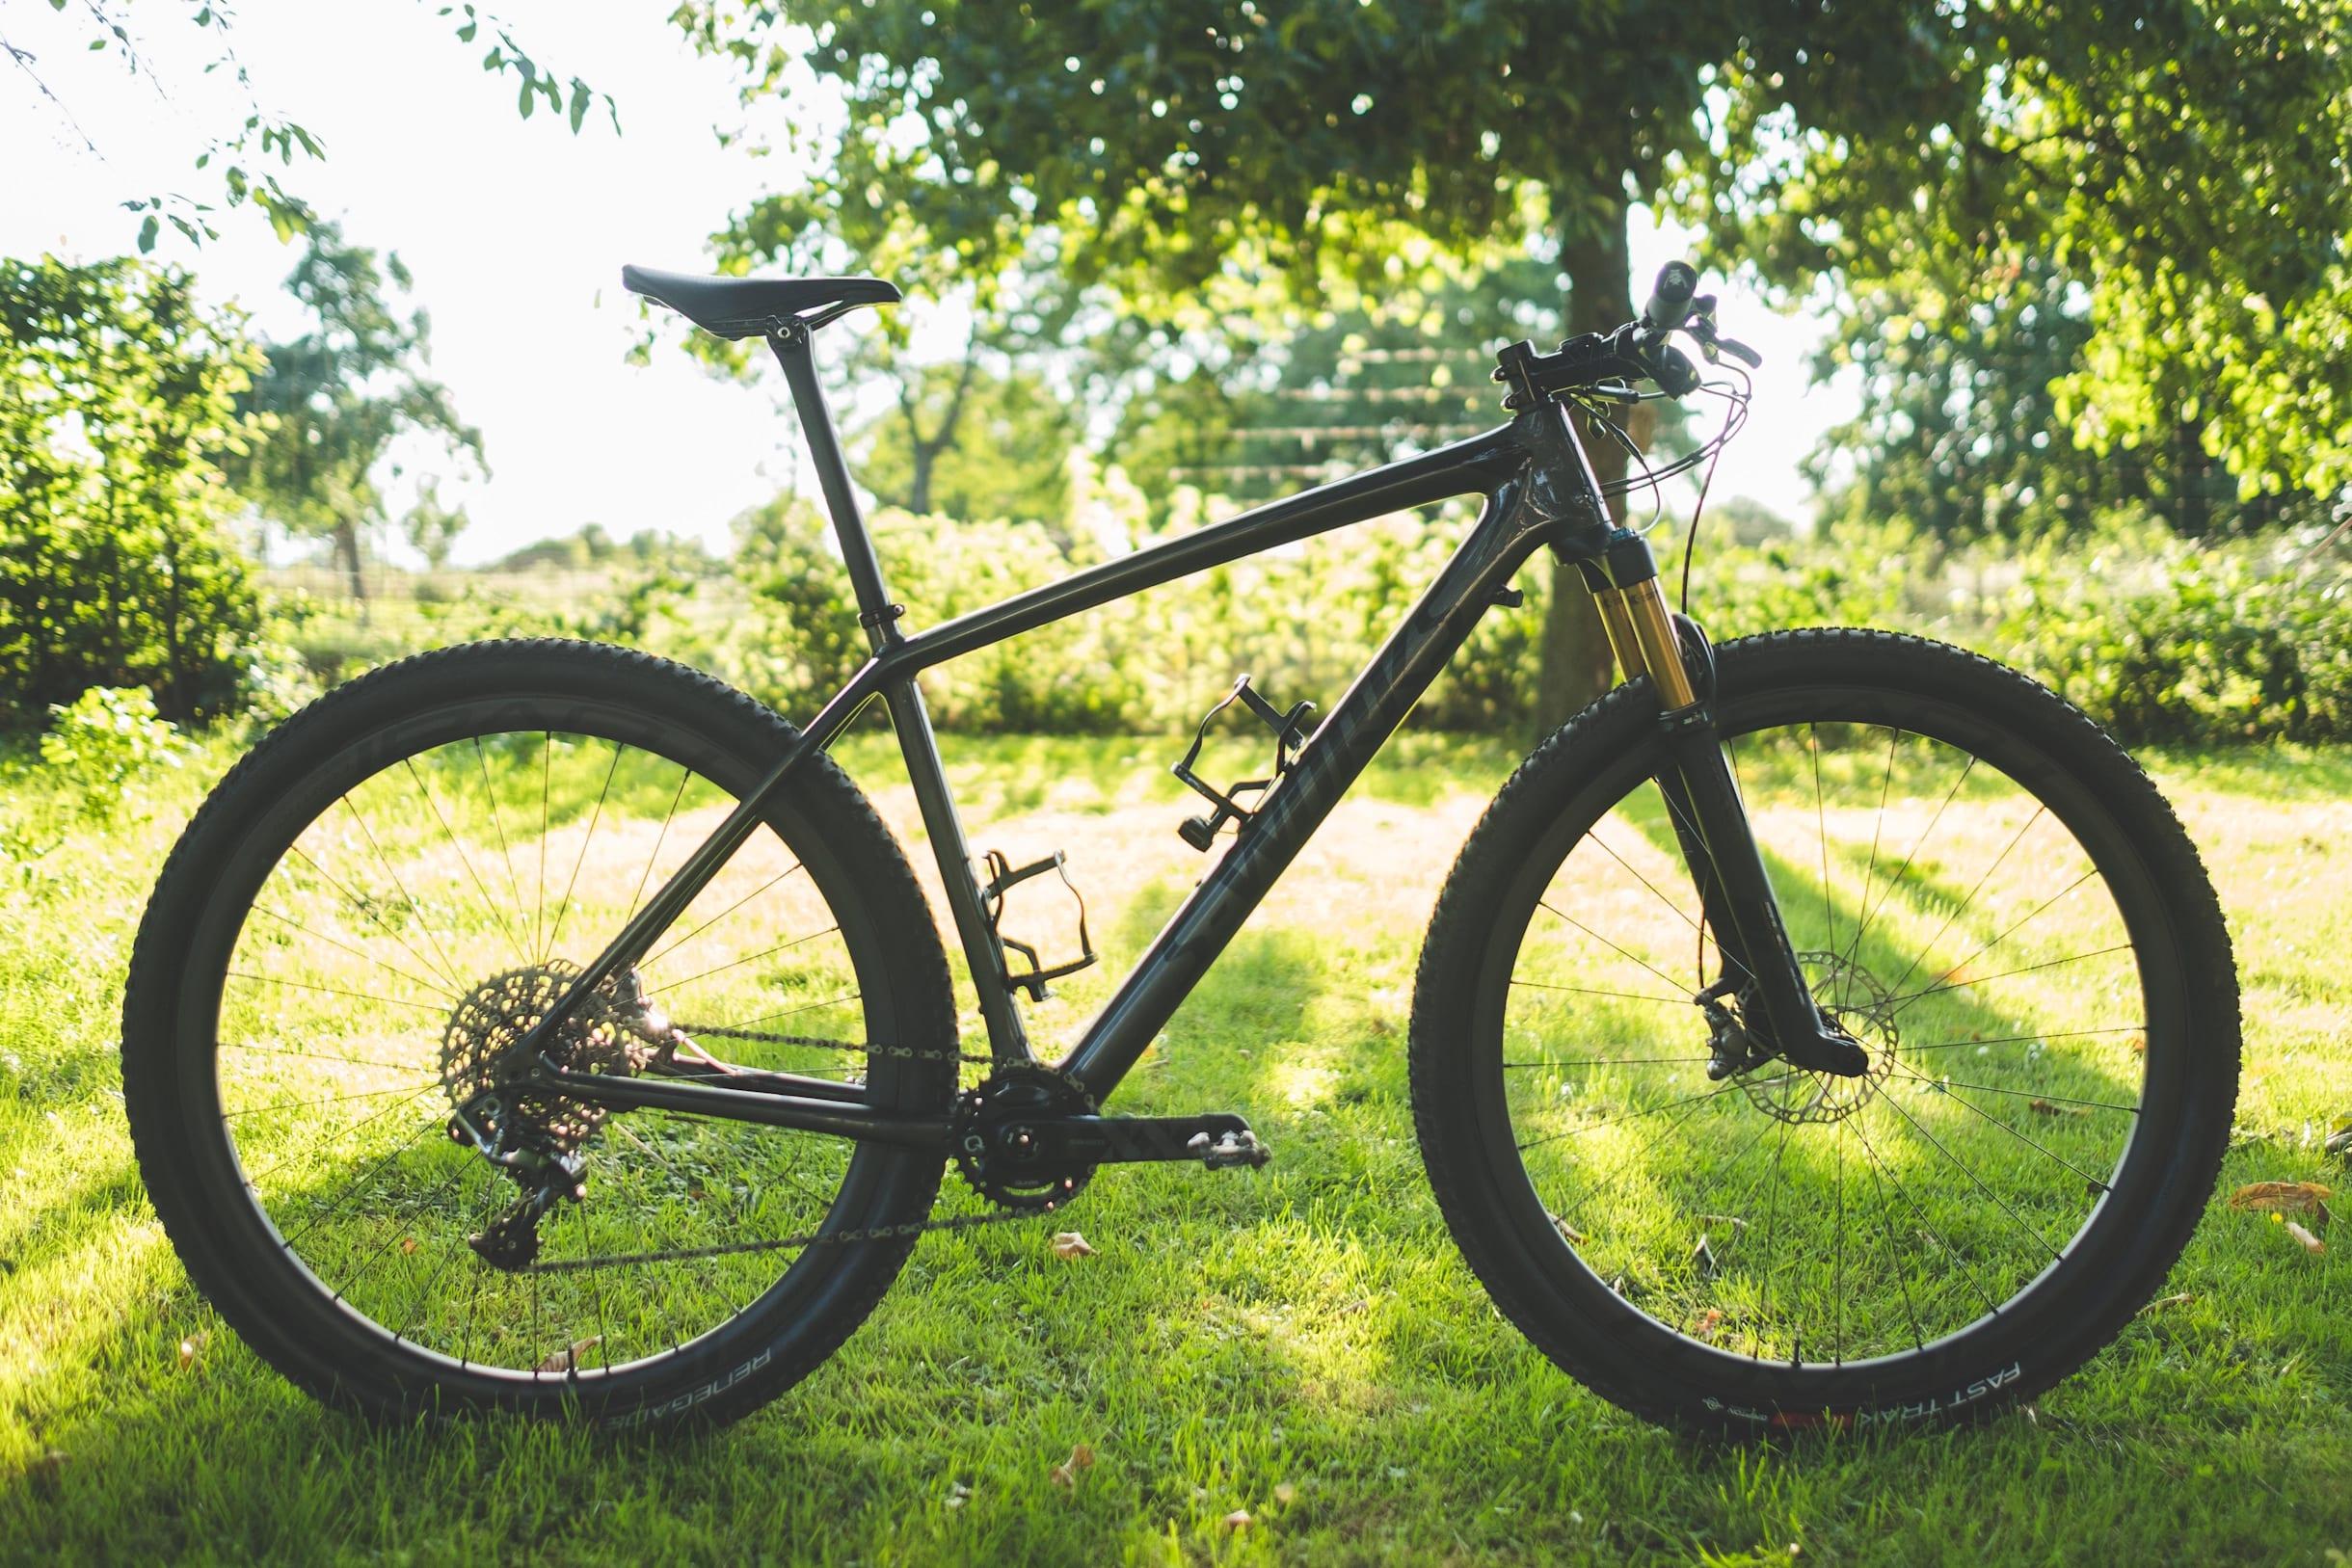 Una bici hardtail con un fondo verde